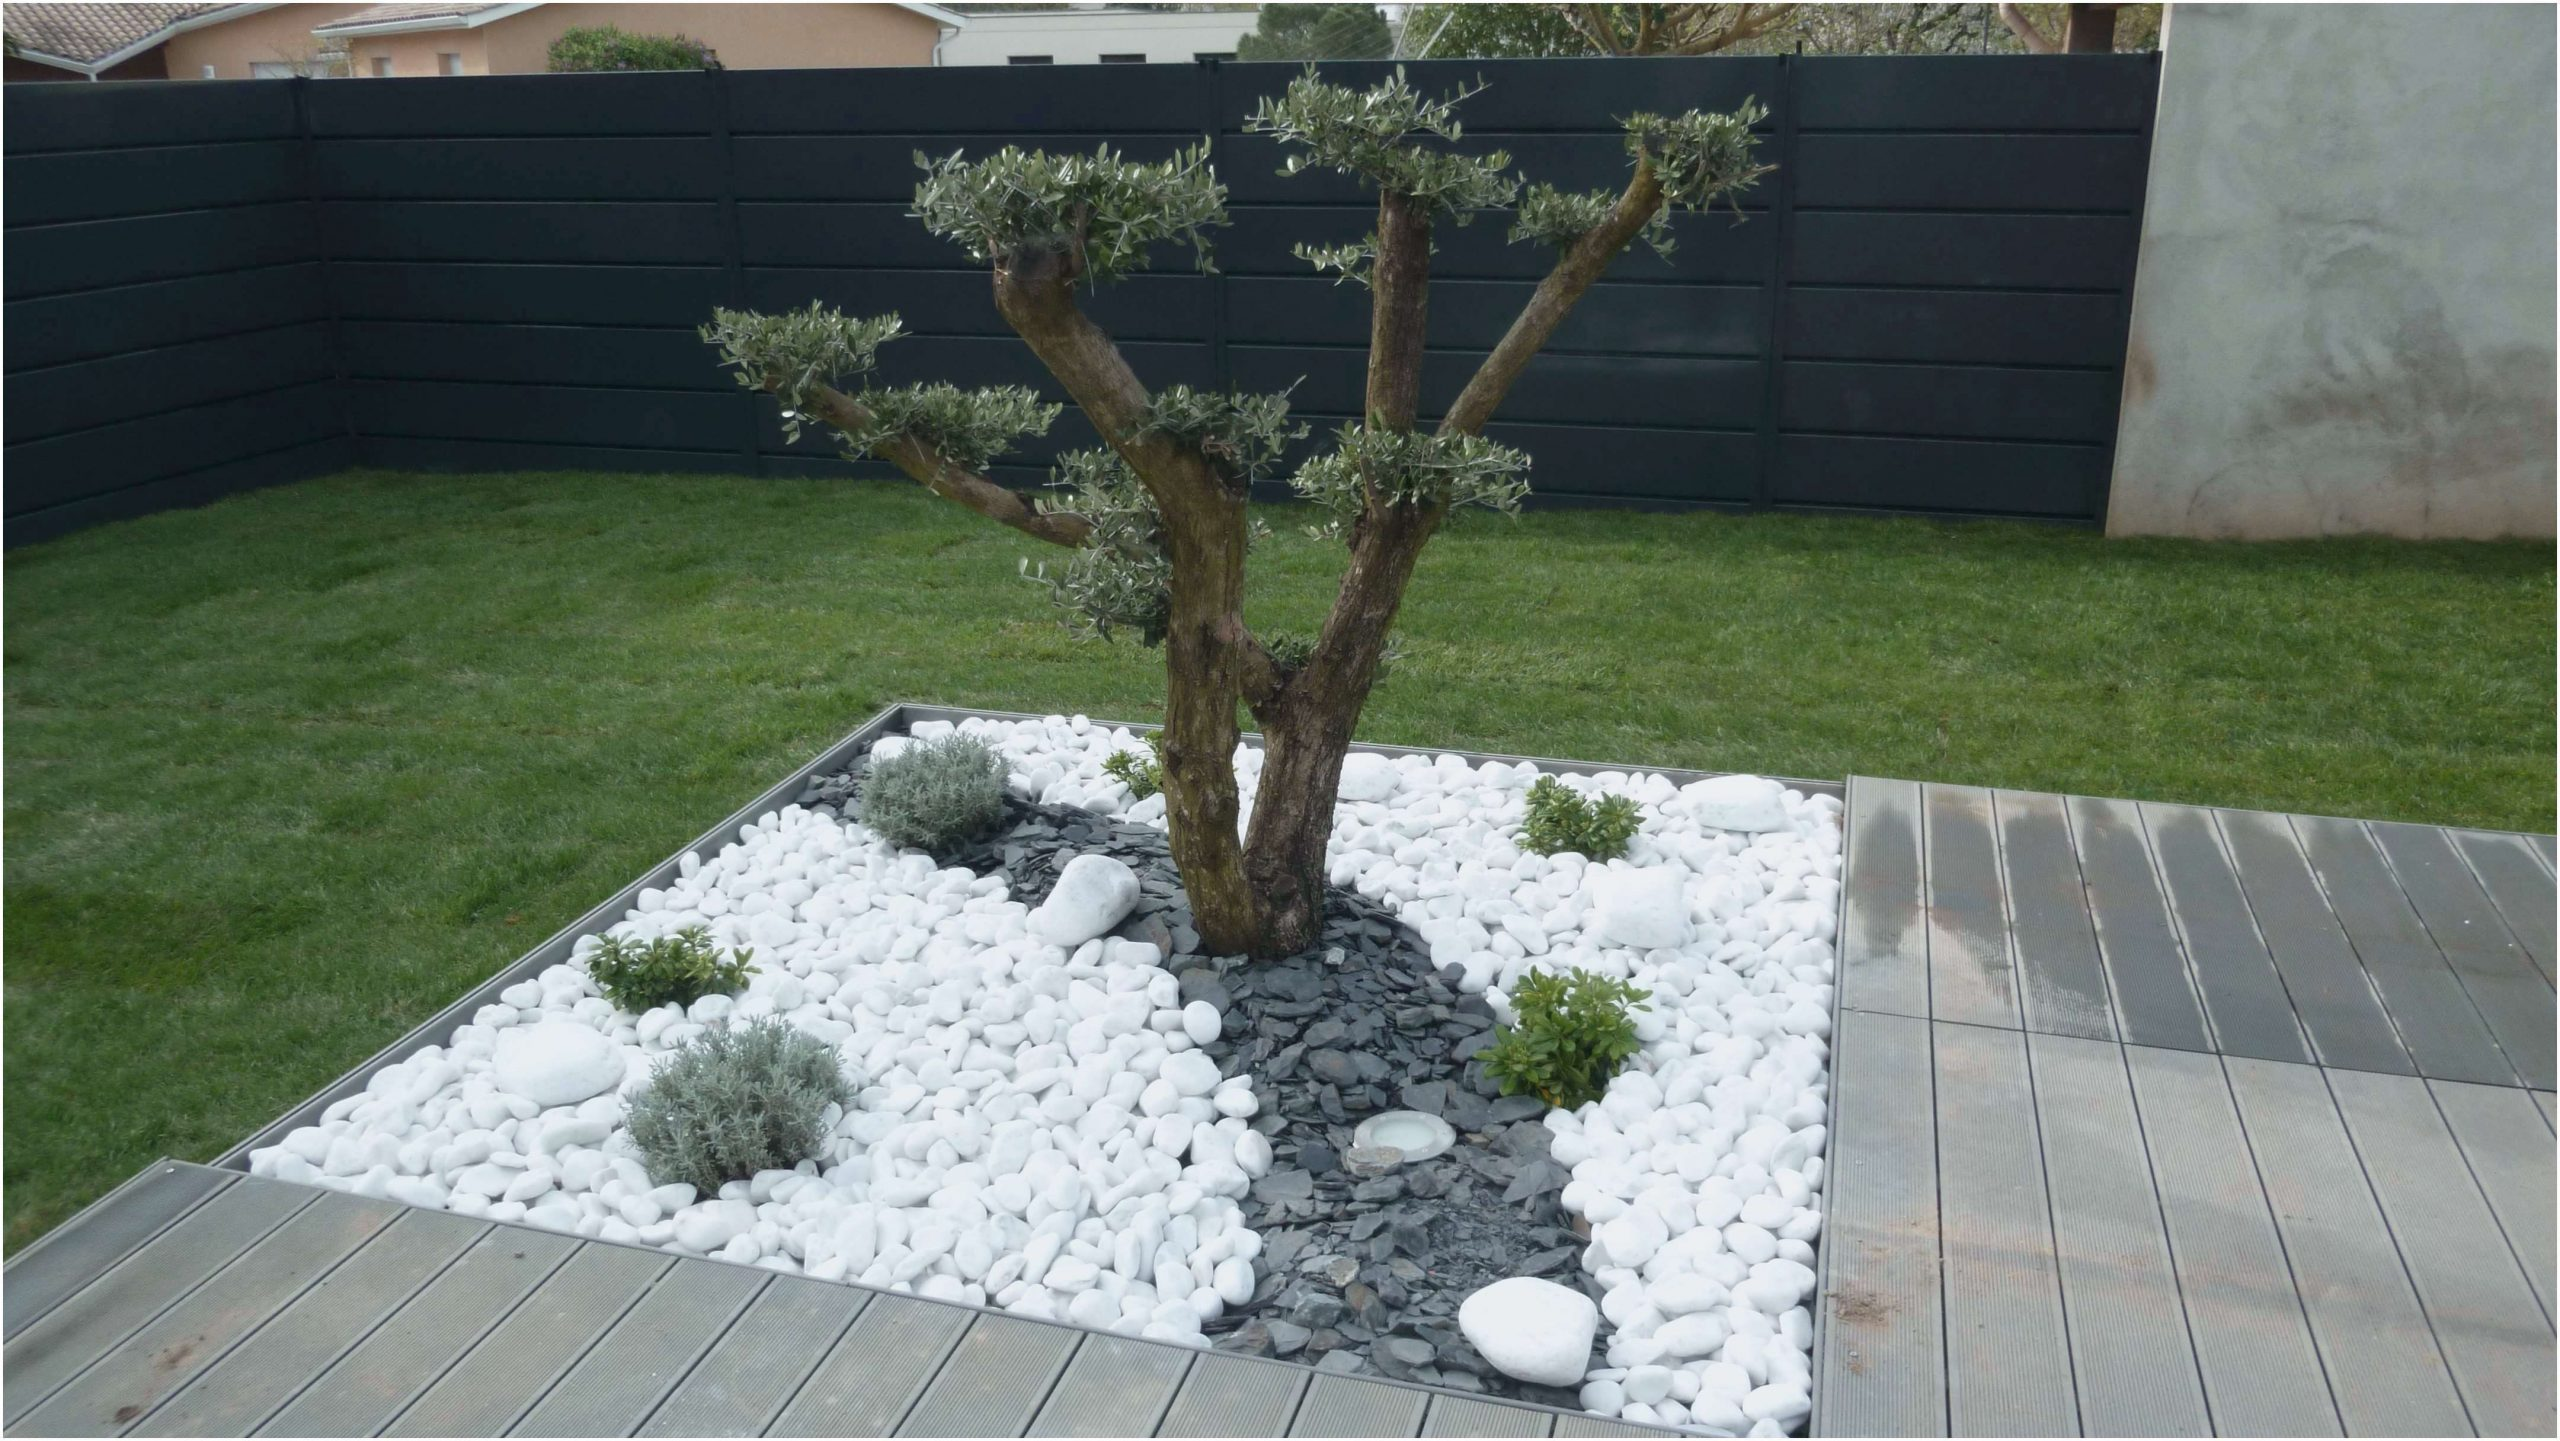 Idee Deco Jardin Avec Gravillon | Idee Deco Jardin ... serapportantà Galets Blancs Pour Jardin Pas Cher